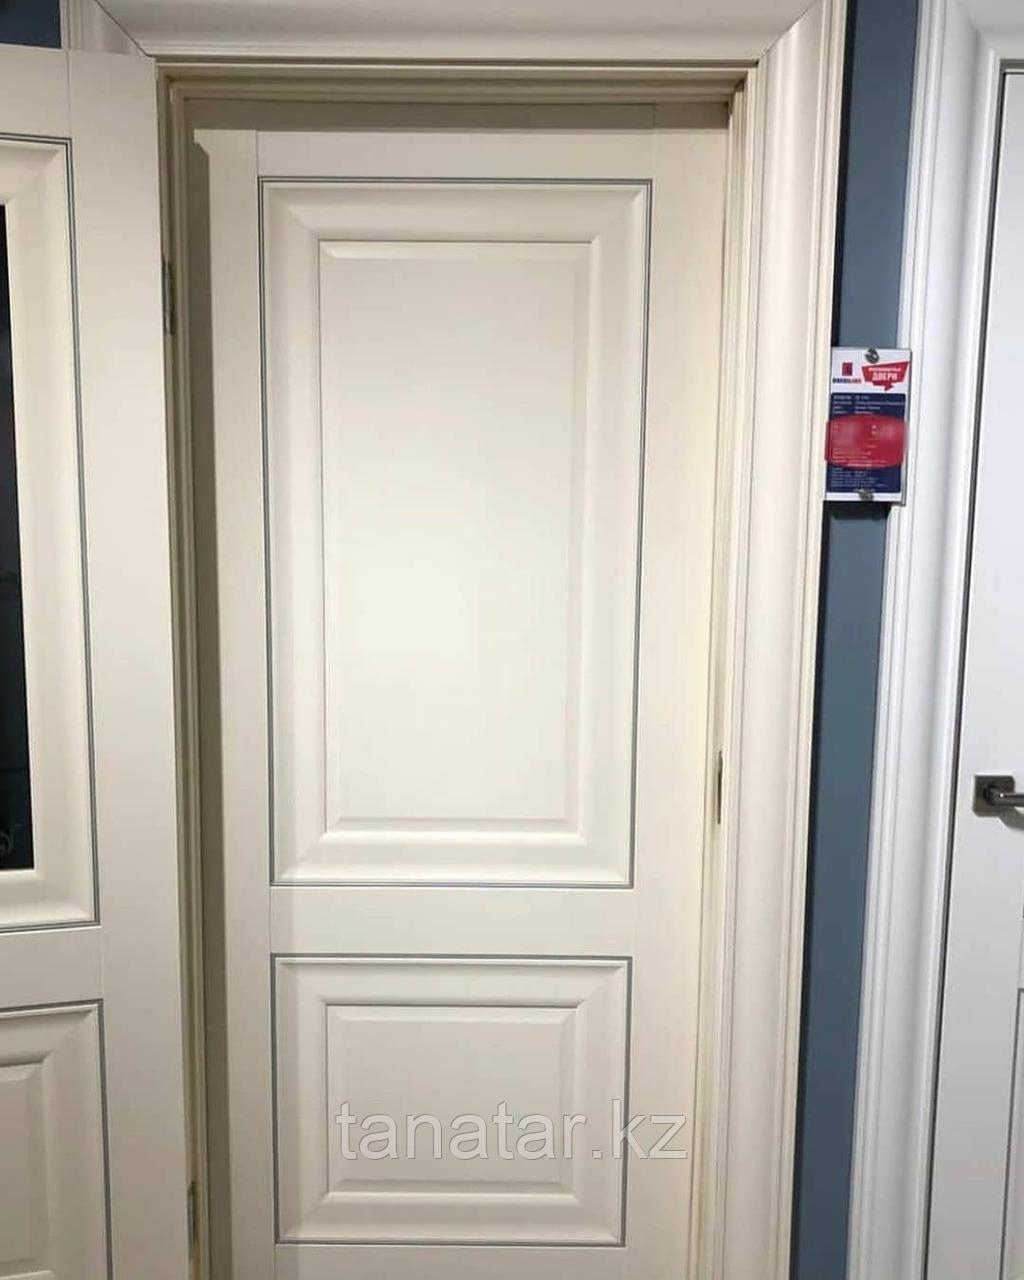 Дверь DL310 Глухая, цвет Ваниль